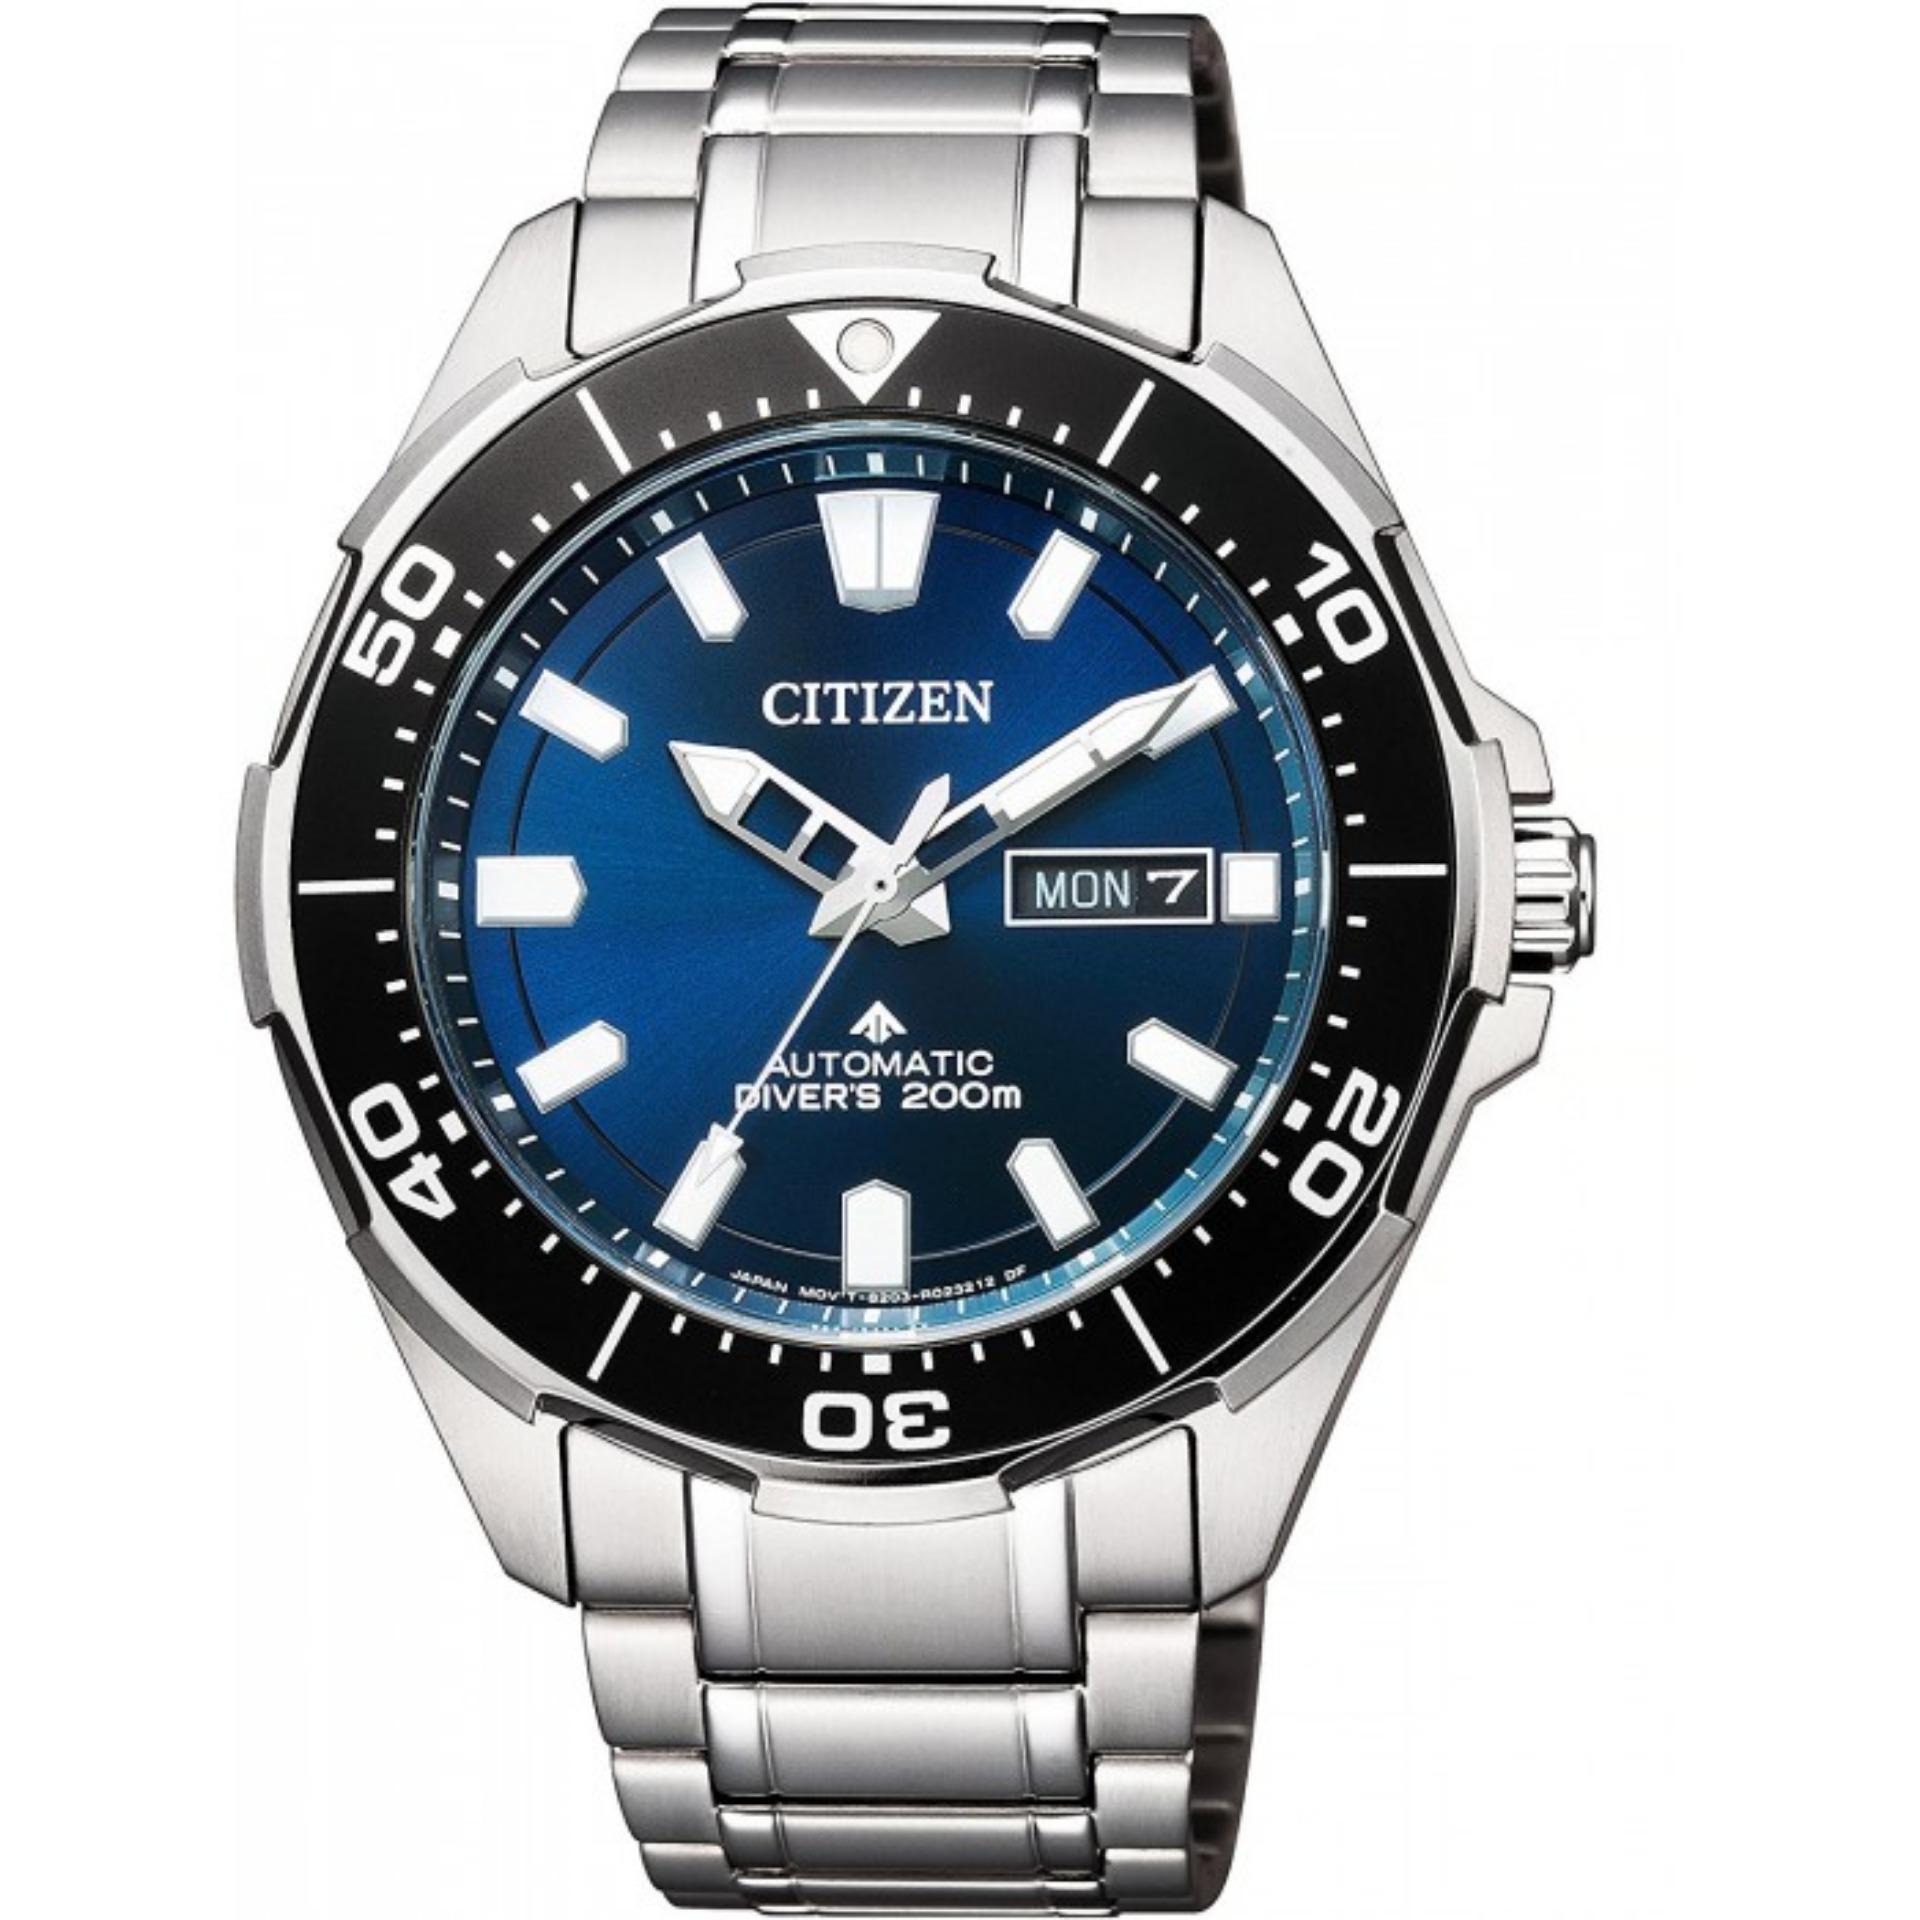 Citizen Automatic Titanium Promaster Dive Watch NY0070-83L